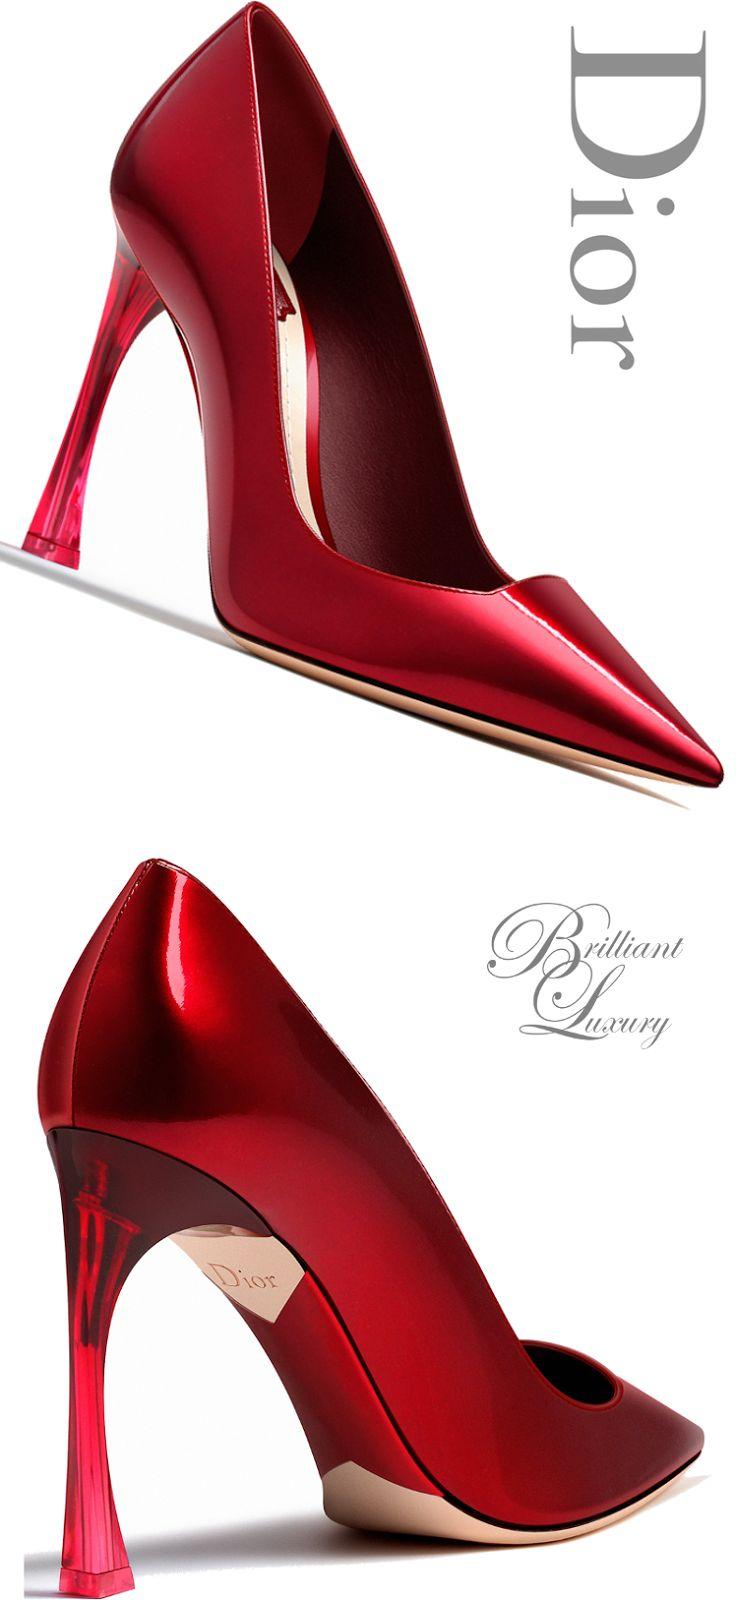 @geralkeys Brilliant Luxury * Dior Pump Fall 2015-16 https://www.facebook.com/Geraldinekeeyss-840801652636770/?fref=nf #shoes